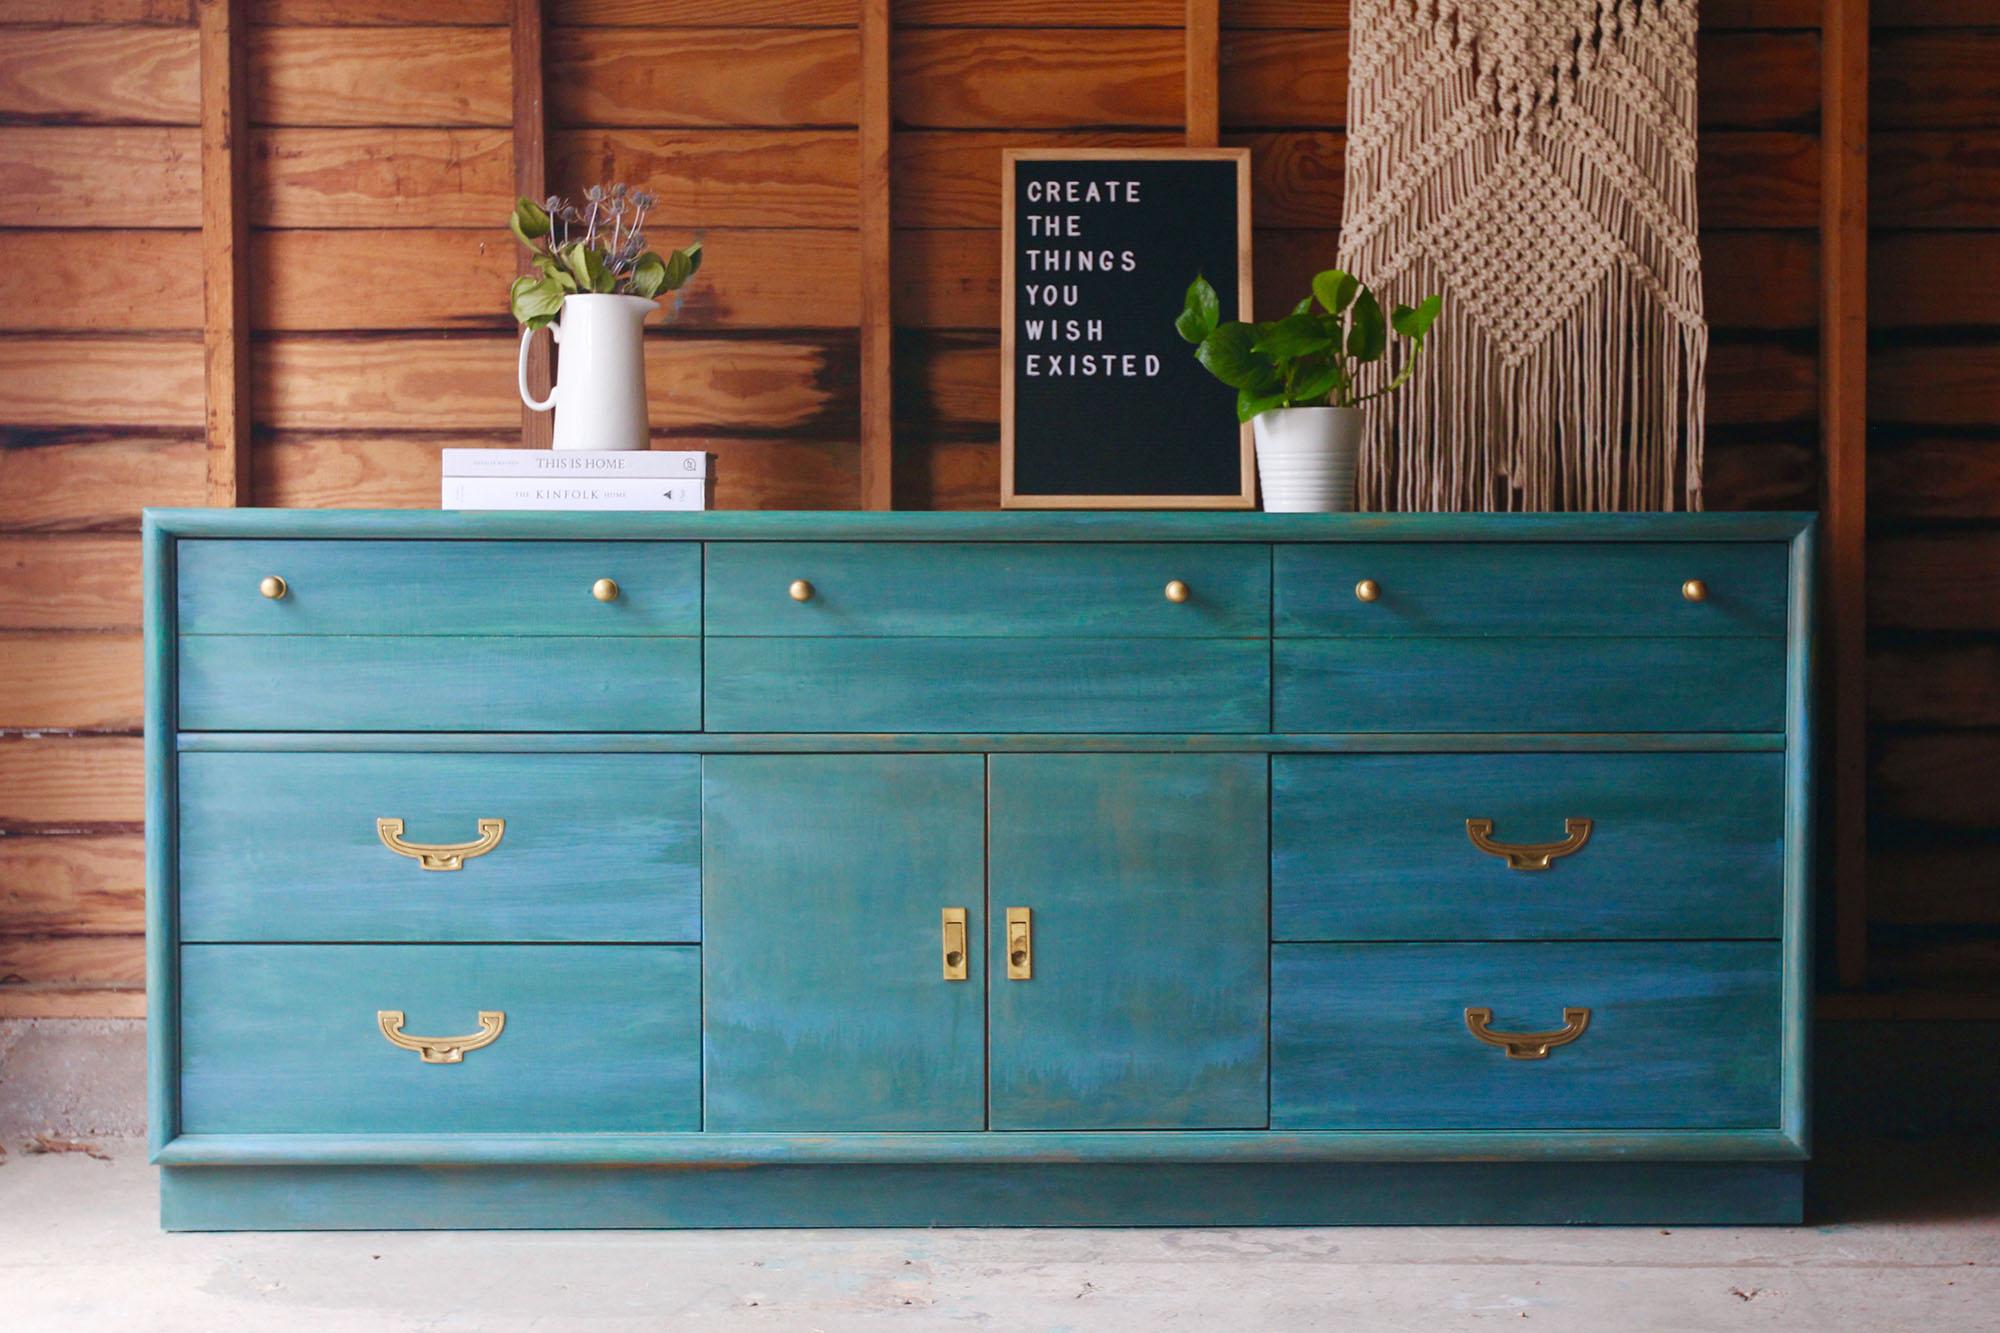 a-simpler-design-annie-sloan-turquoise-teal-water-technique-jpg5.jpg